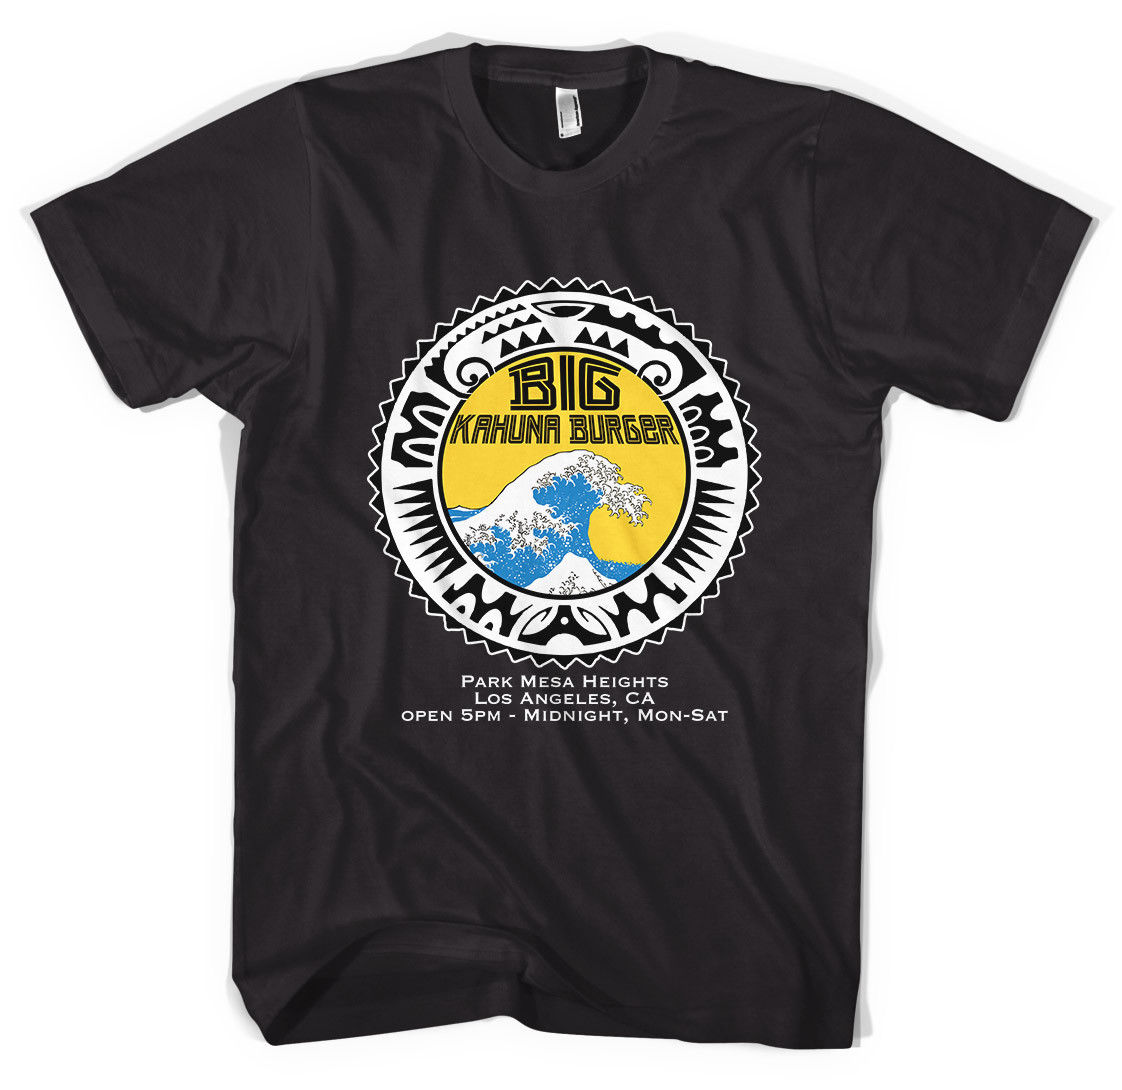 big-kahuna-burger-pulp-fiction-font-b-tarantino-b-font-unisex-t-shirt-all-sizes-t-shirt-hipster-cool-o-neck-tops-gray-style